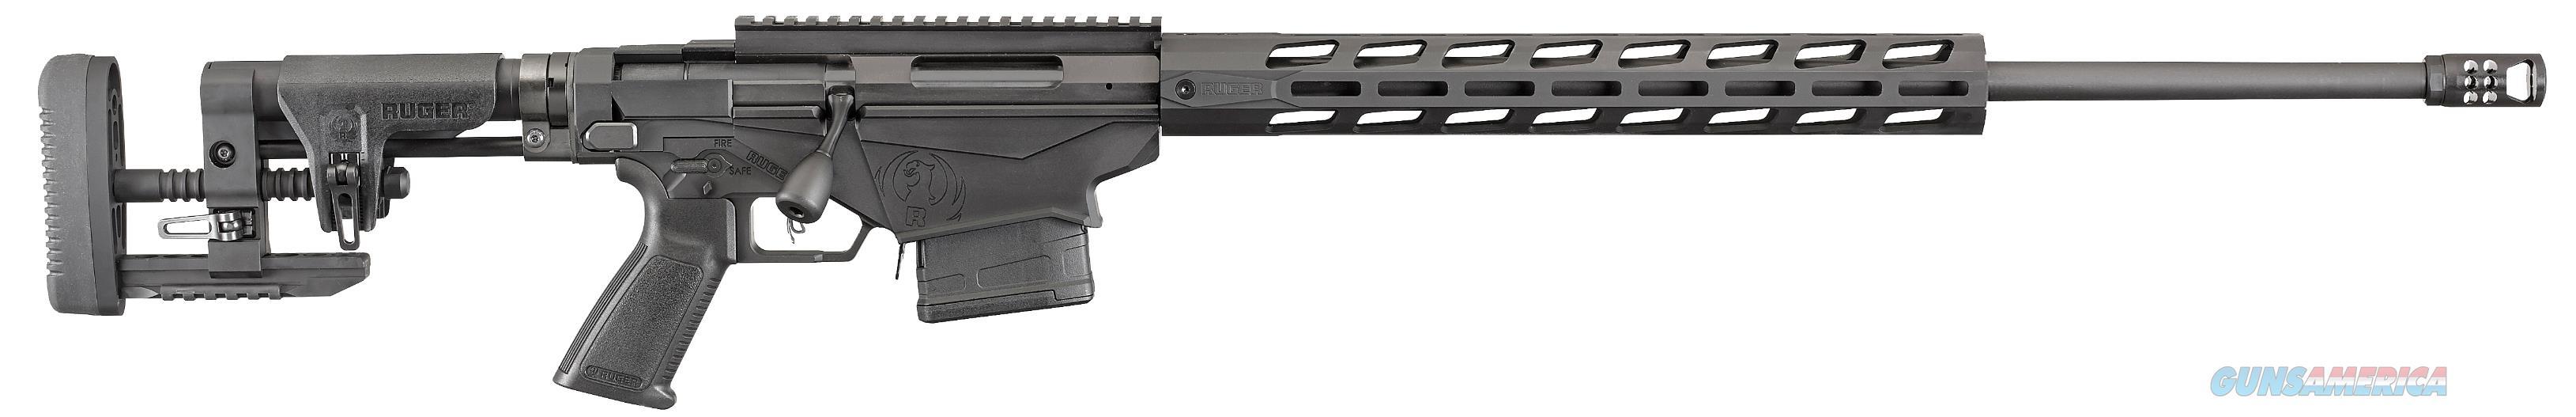 Ruger Precision, Rug 18032 Precision 6mmcr 15in Mlok Hdngrd 24  10r  Guns > Pistols > 1911 Pistol Copies (non-Colt)